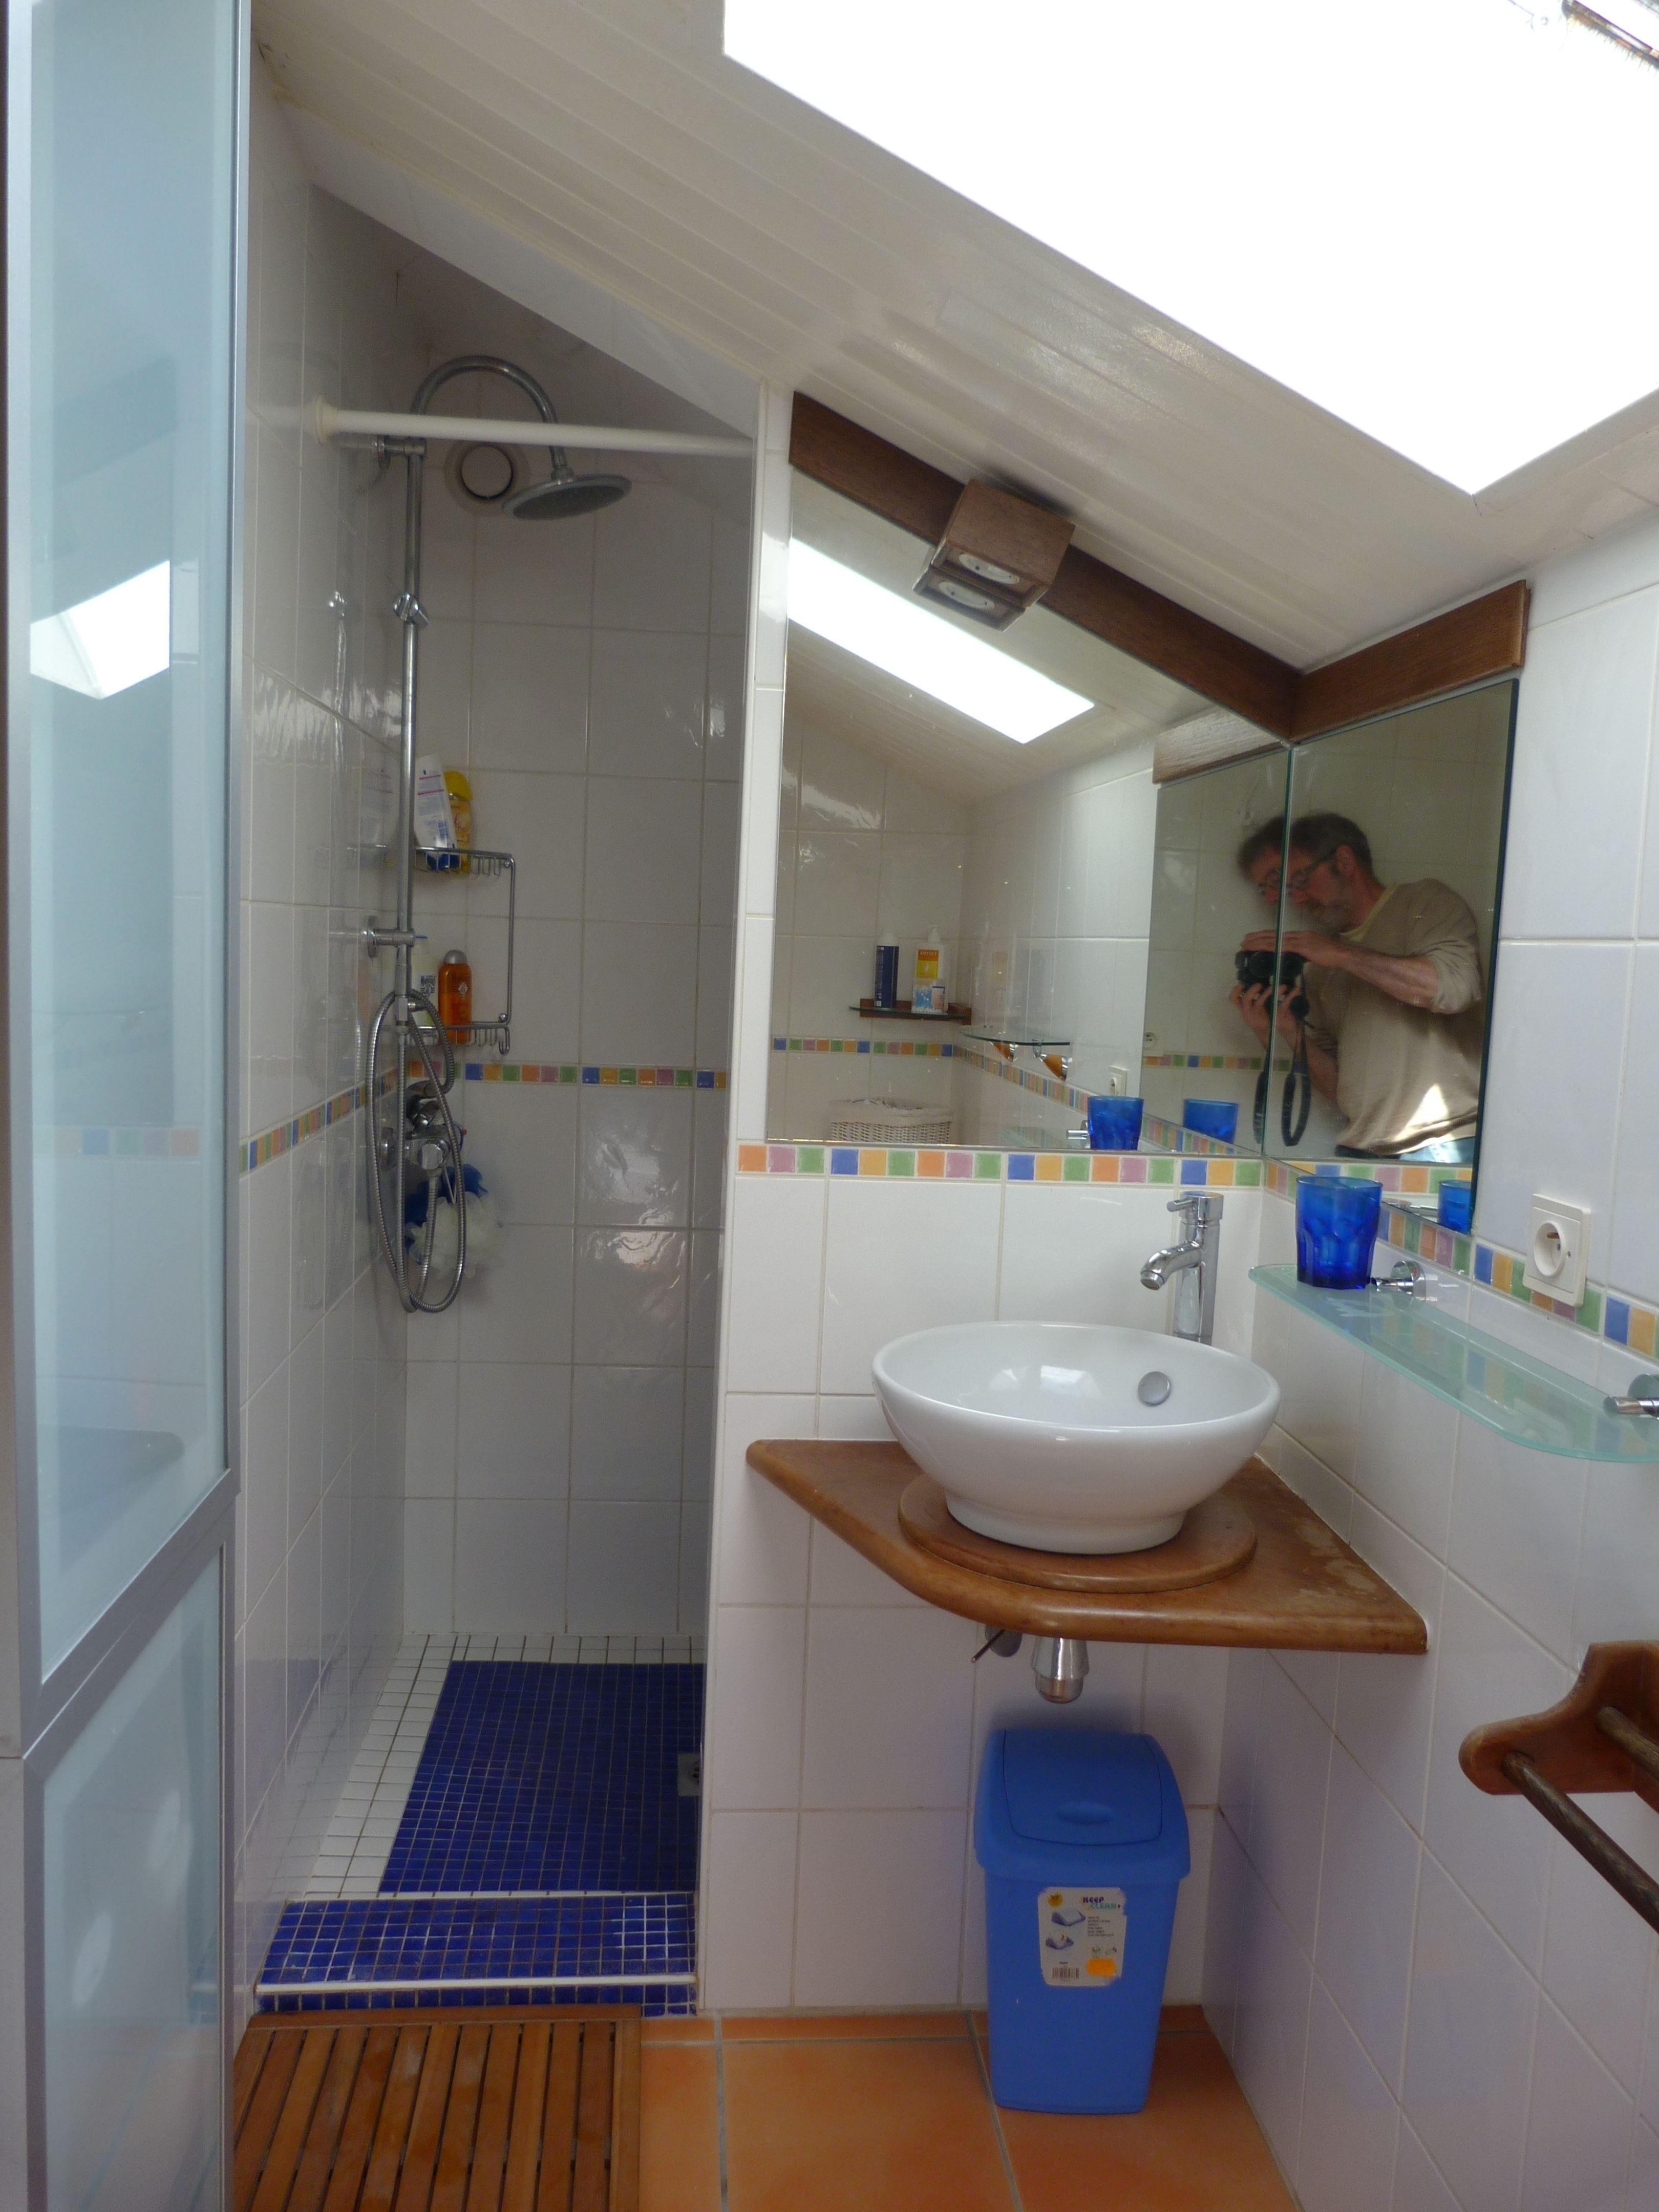 Chambre avec douche beautiful salle de bain avec douche 2 for Petite salle de bain avec douche et wc